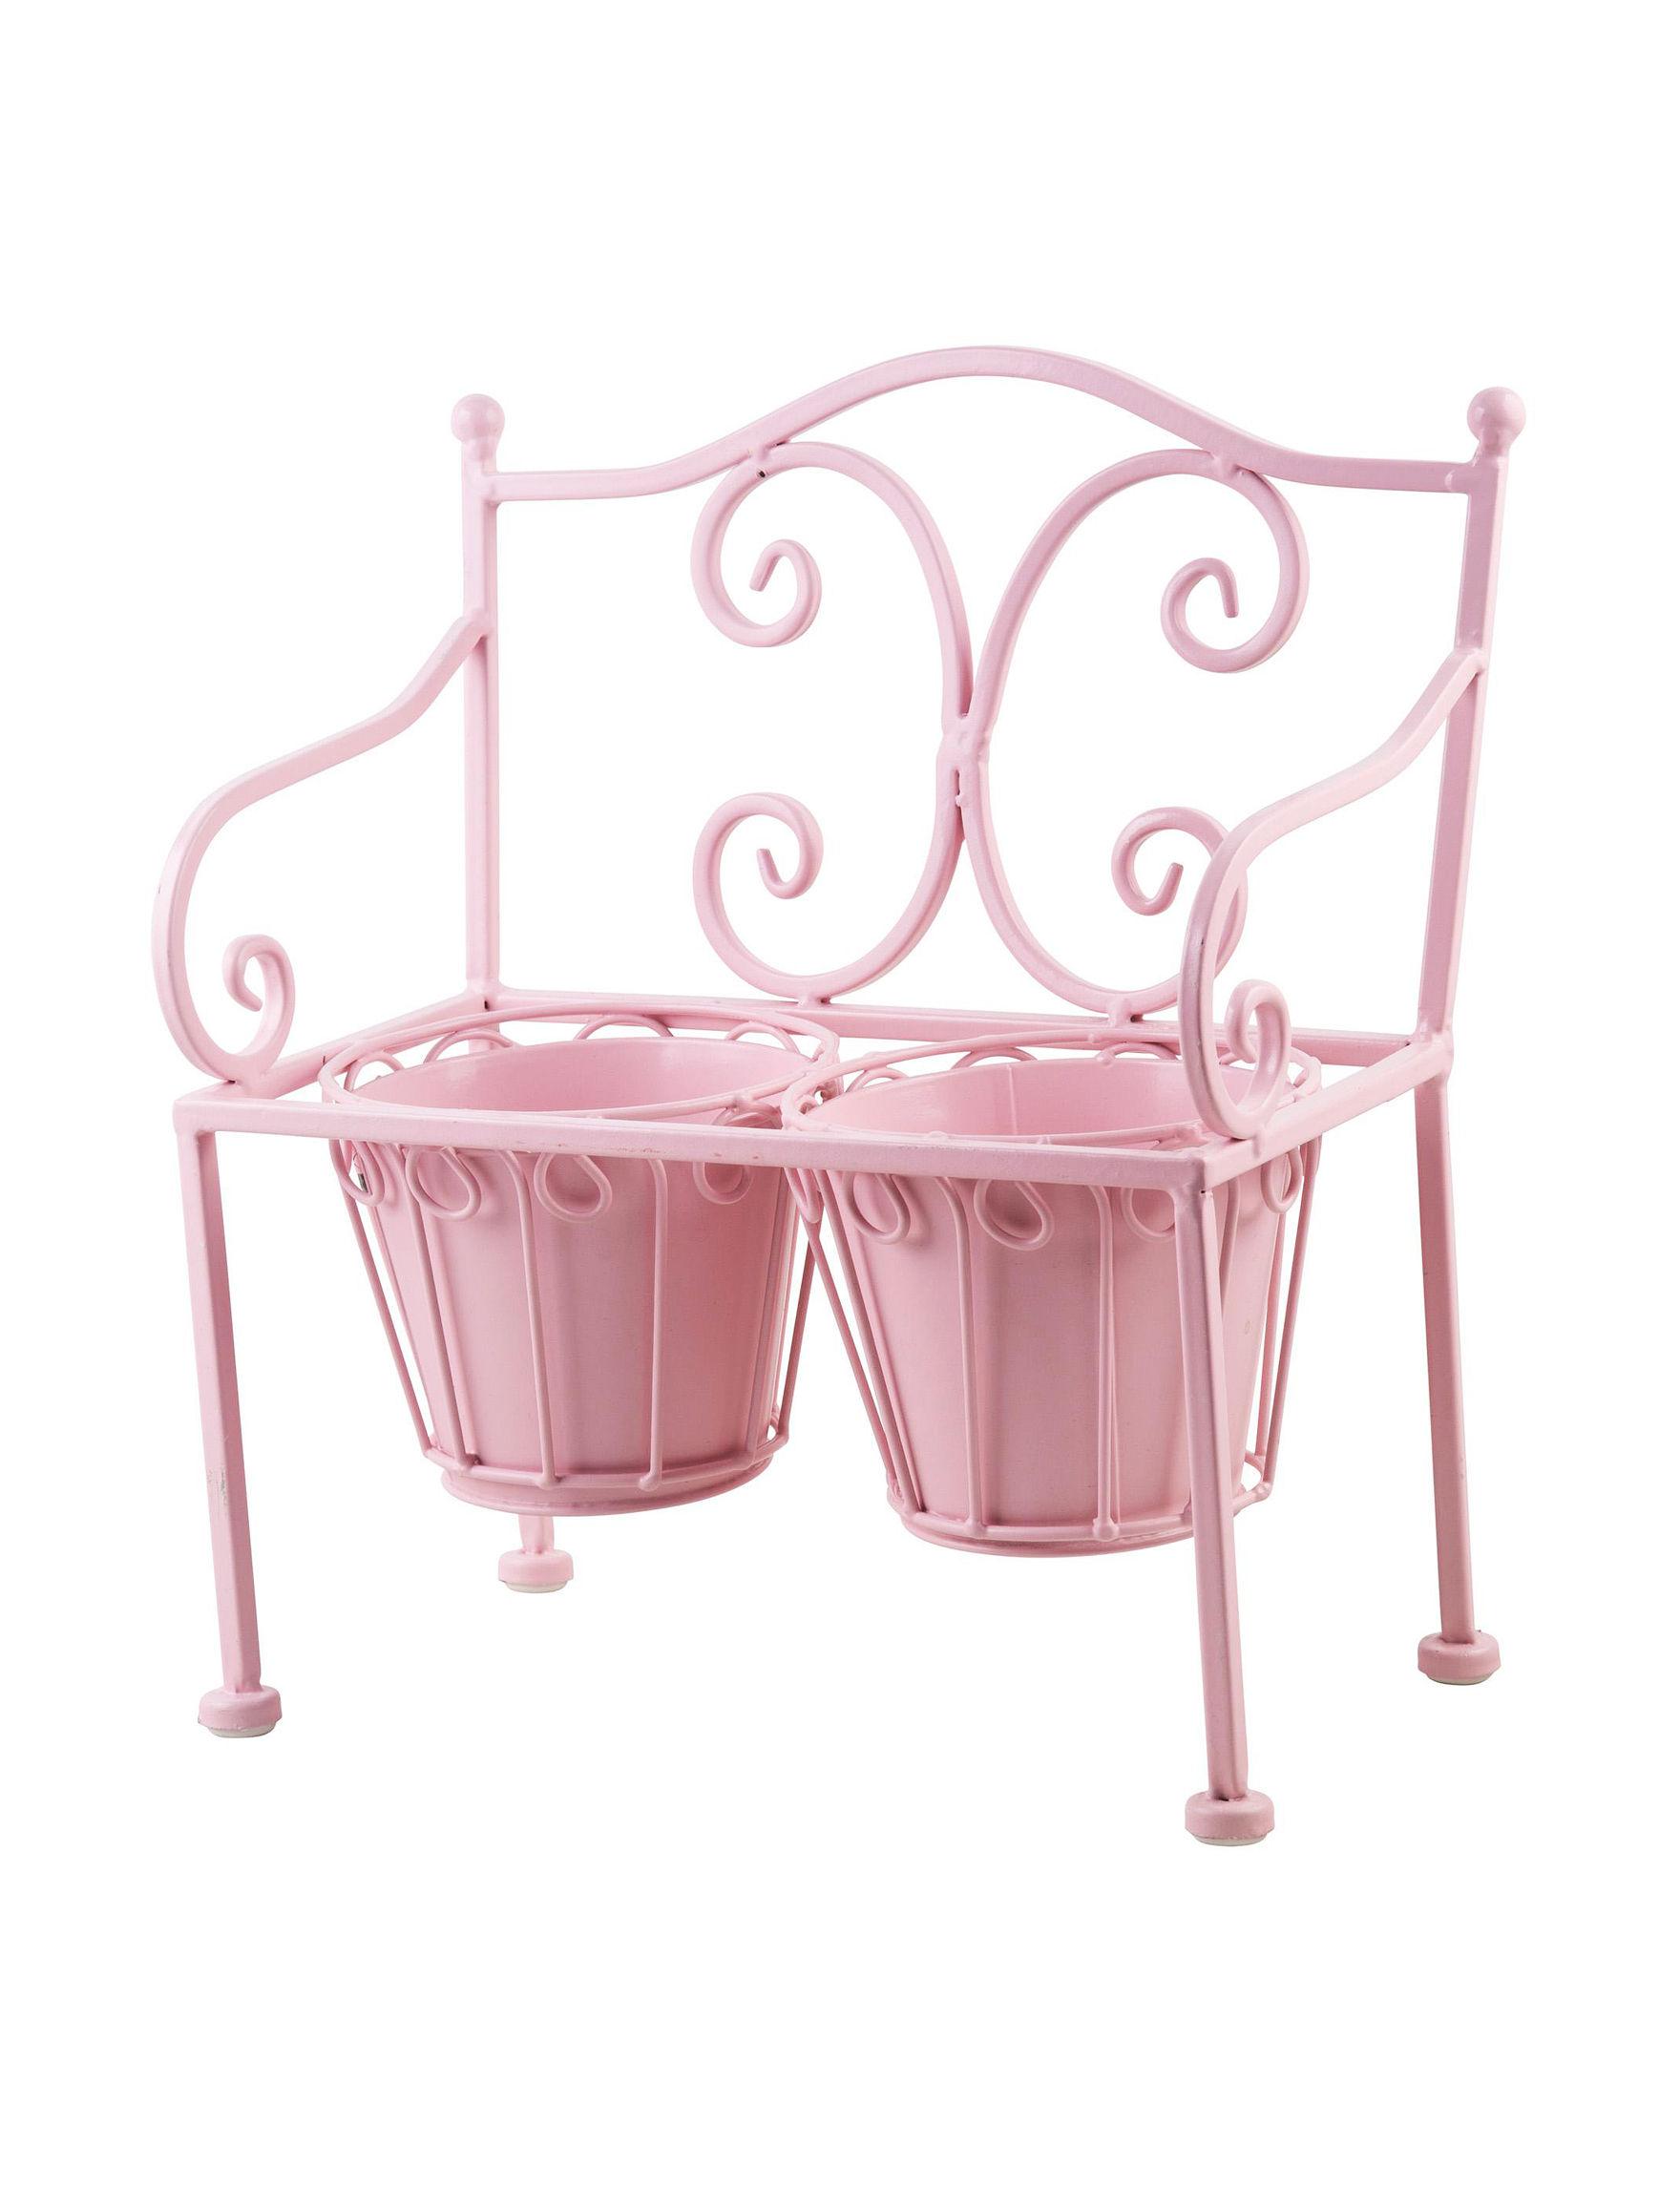 Home Essentials Pink Garden Decor & Planters Outdoor Decor